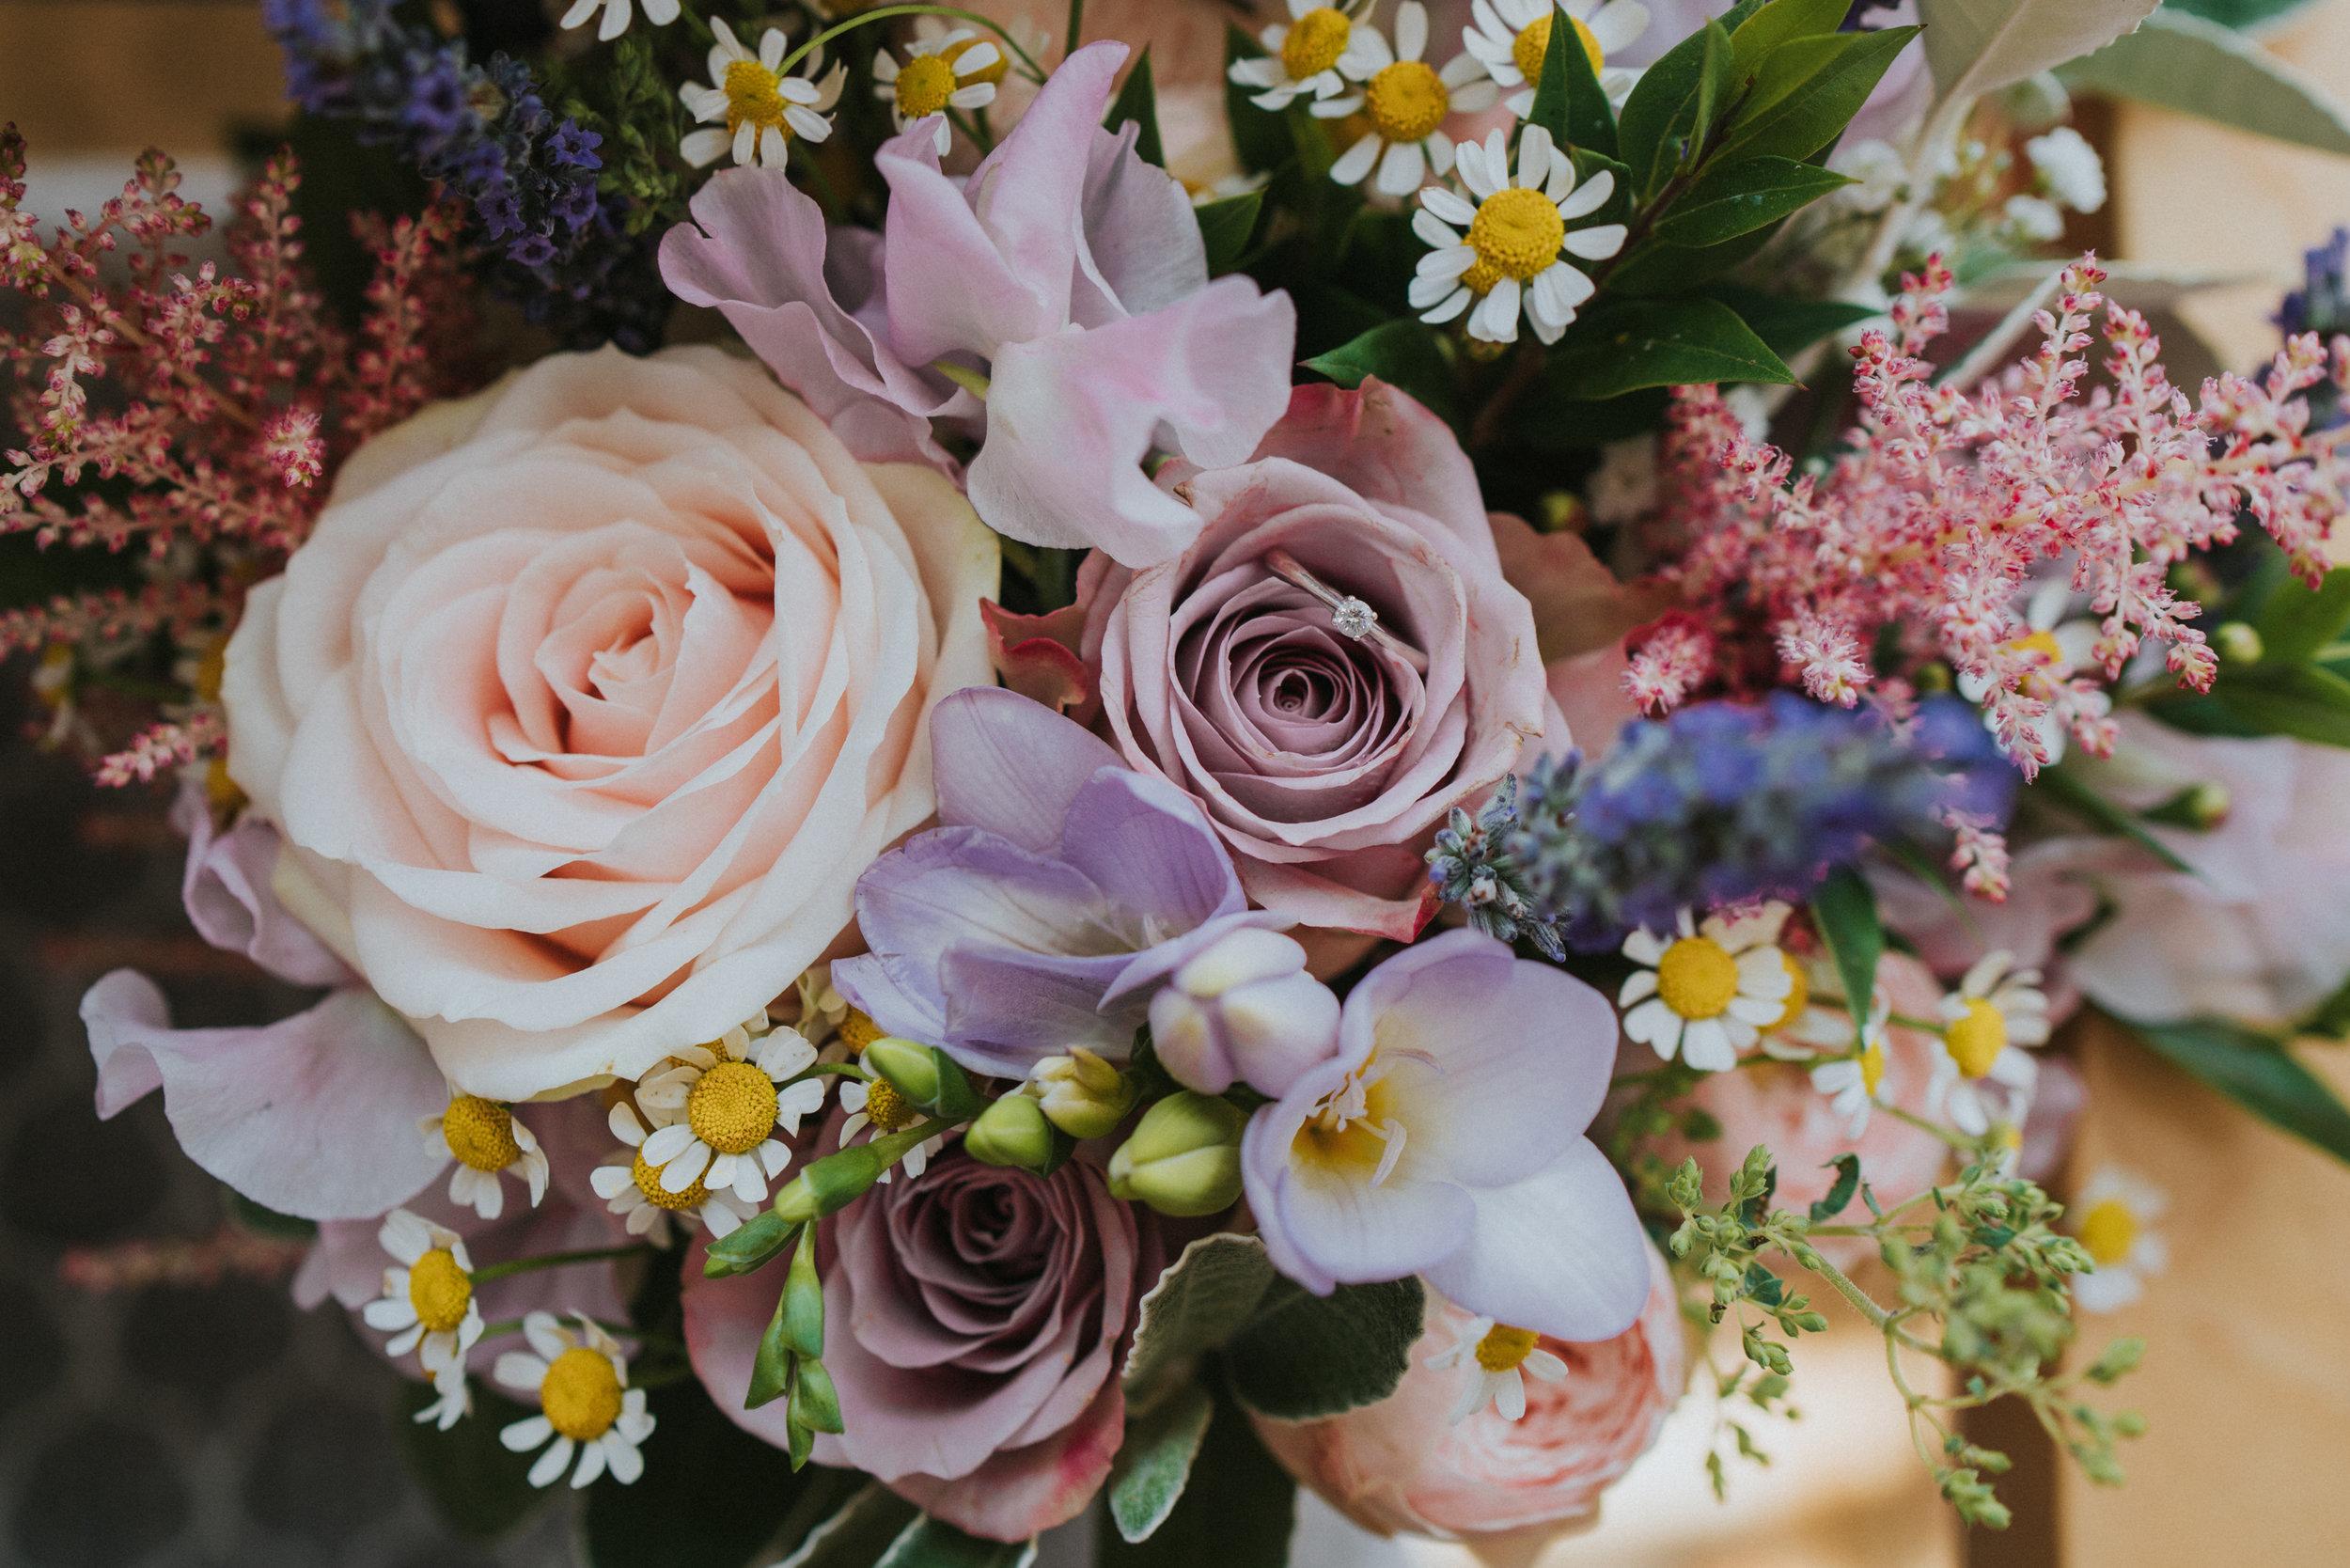 Grace-Elizabeth-Georgie-Amalaketu-Firstsite-Colchester-Essex-Boho-Buddhist-Wedding-Alternative-Wedding-Photography-Essex (11 of 100).jpg